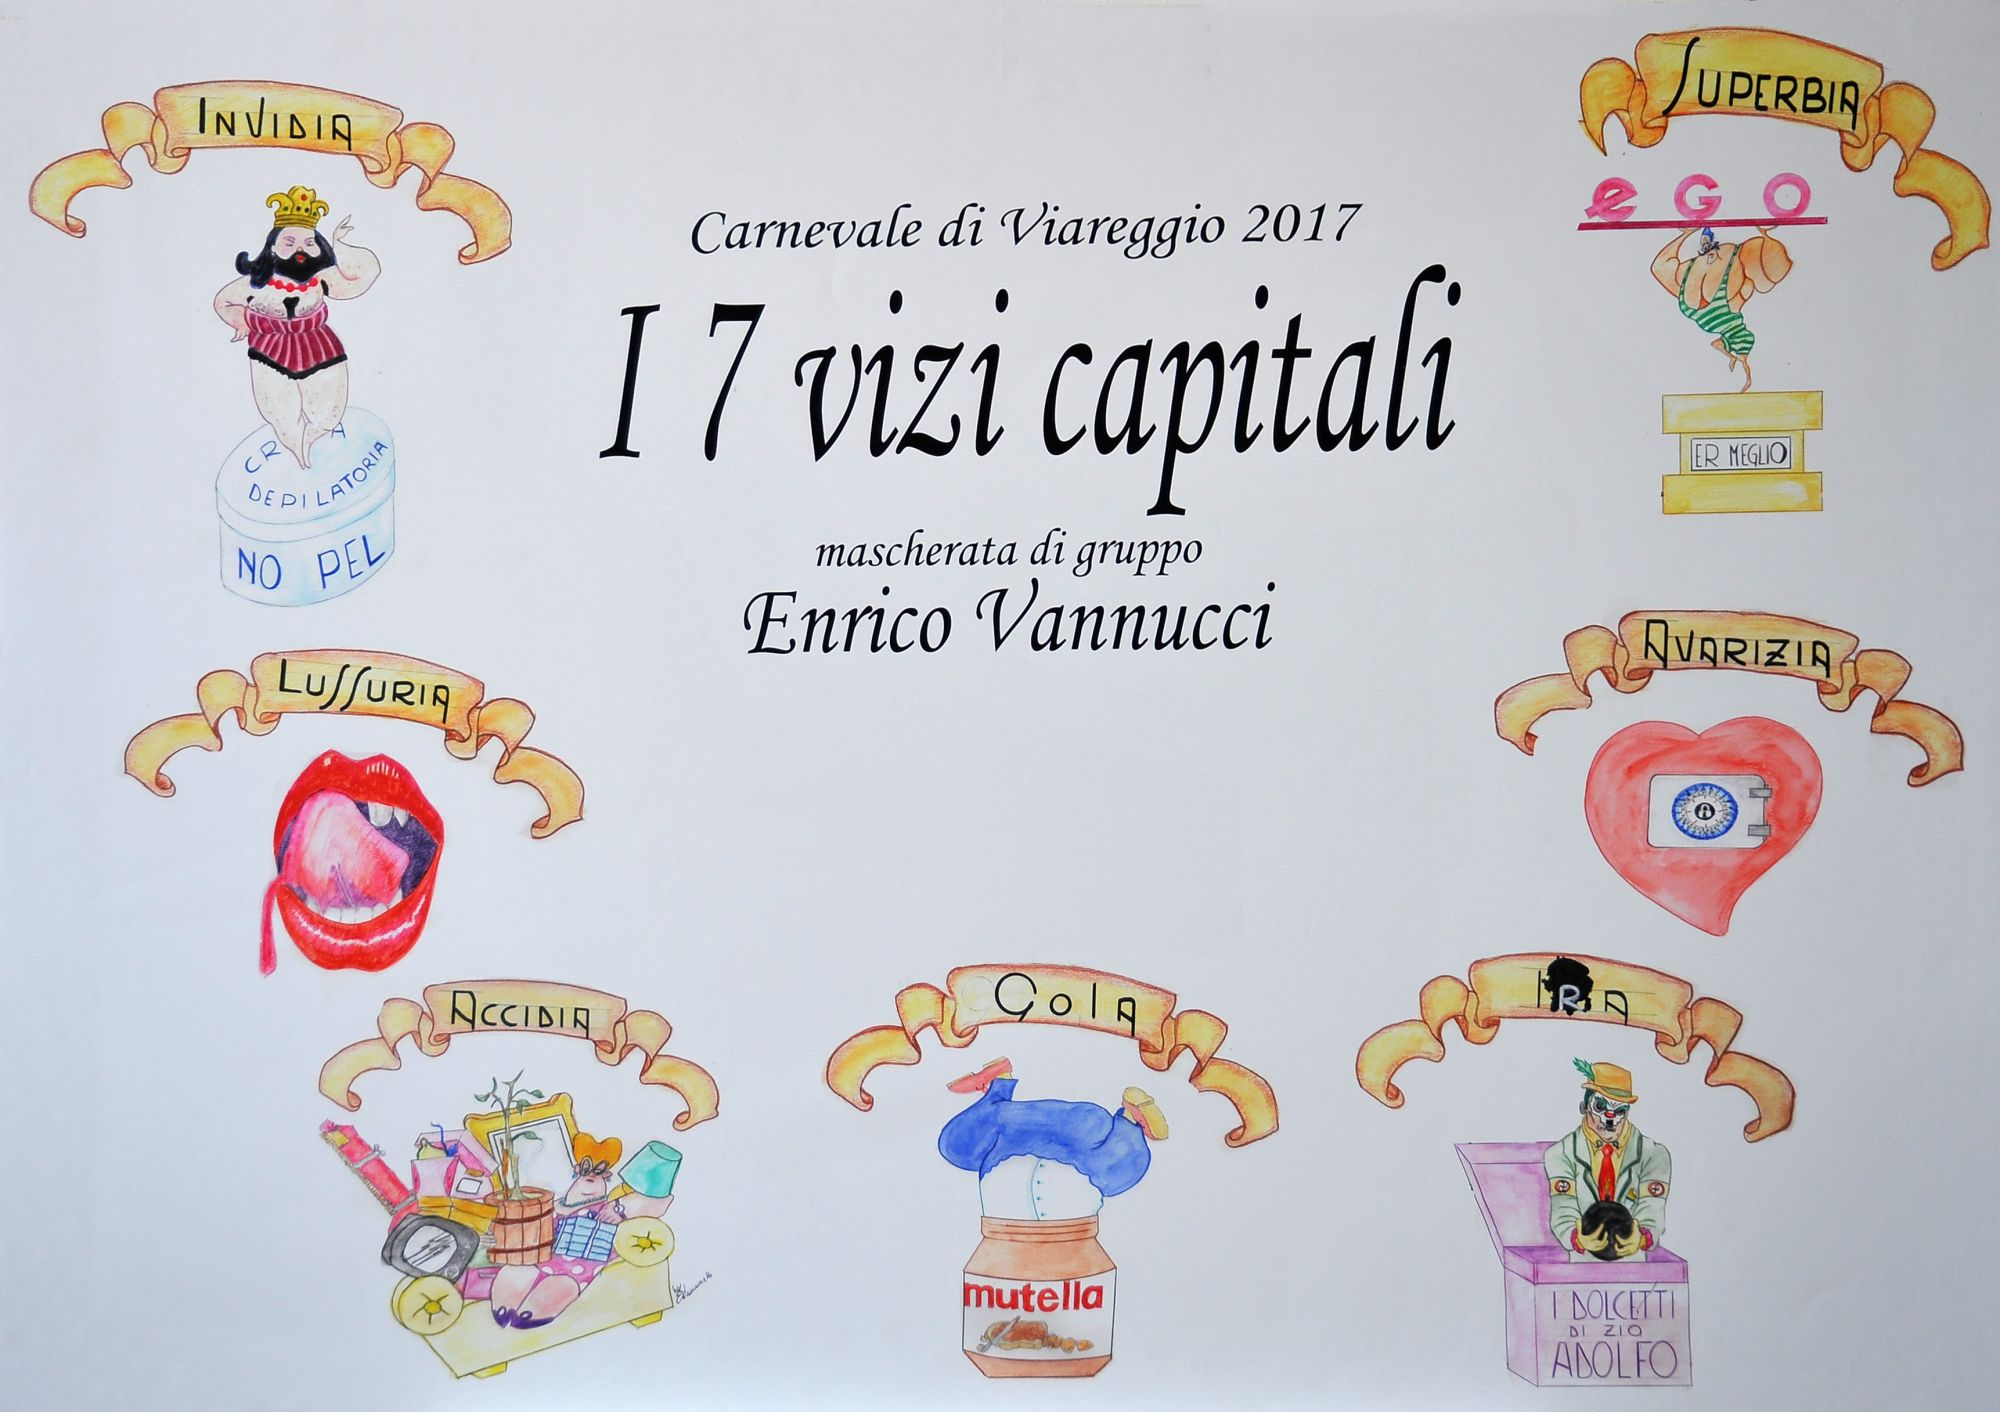 Sette peccati capitali simboli